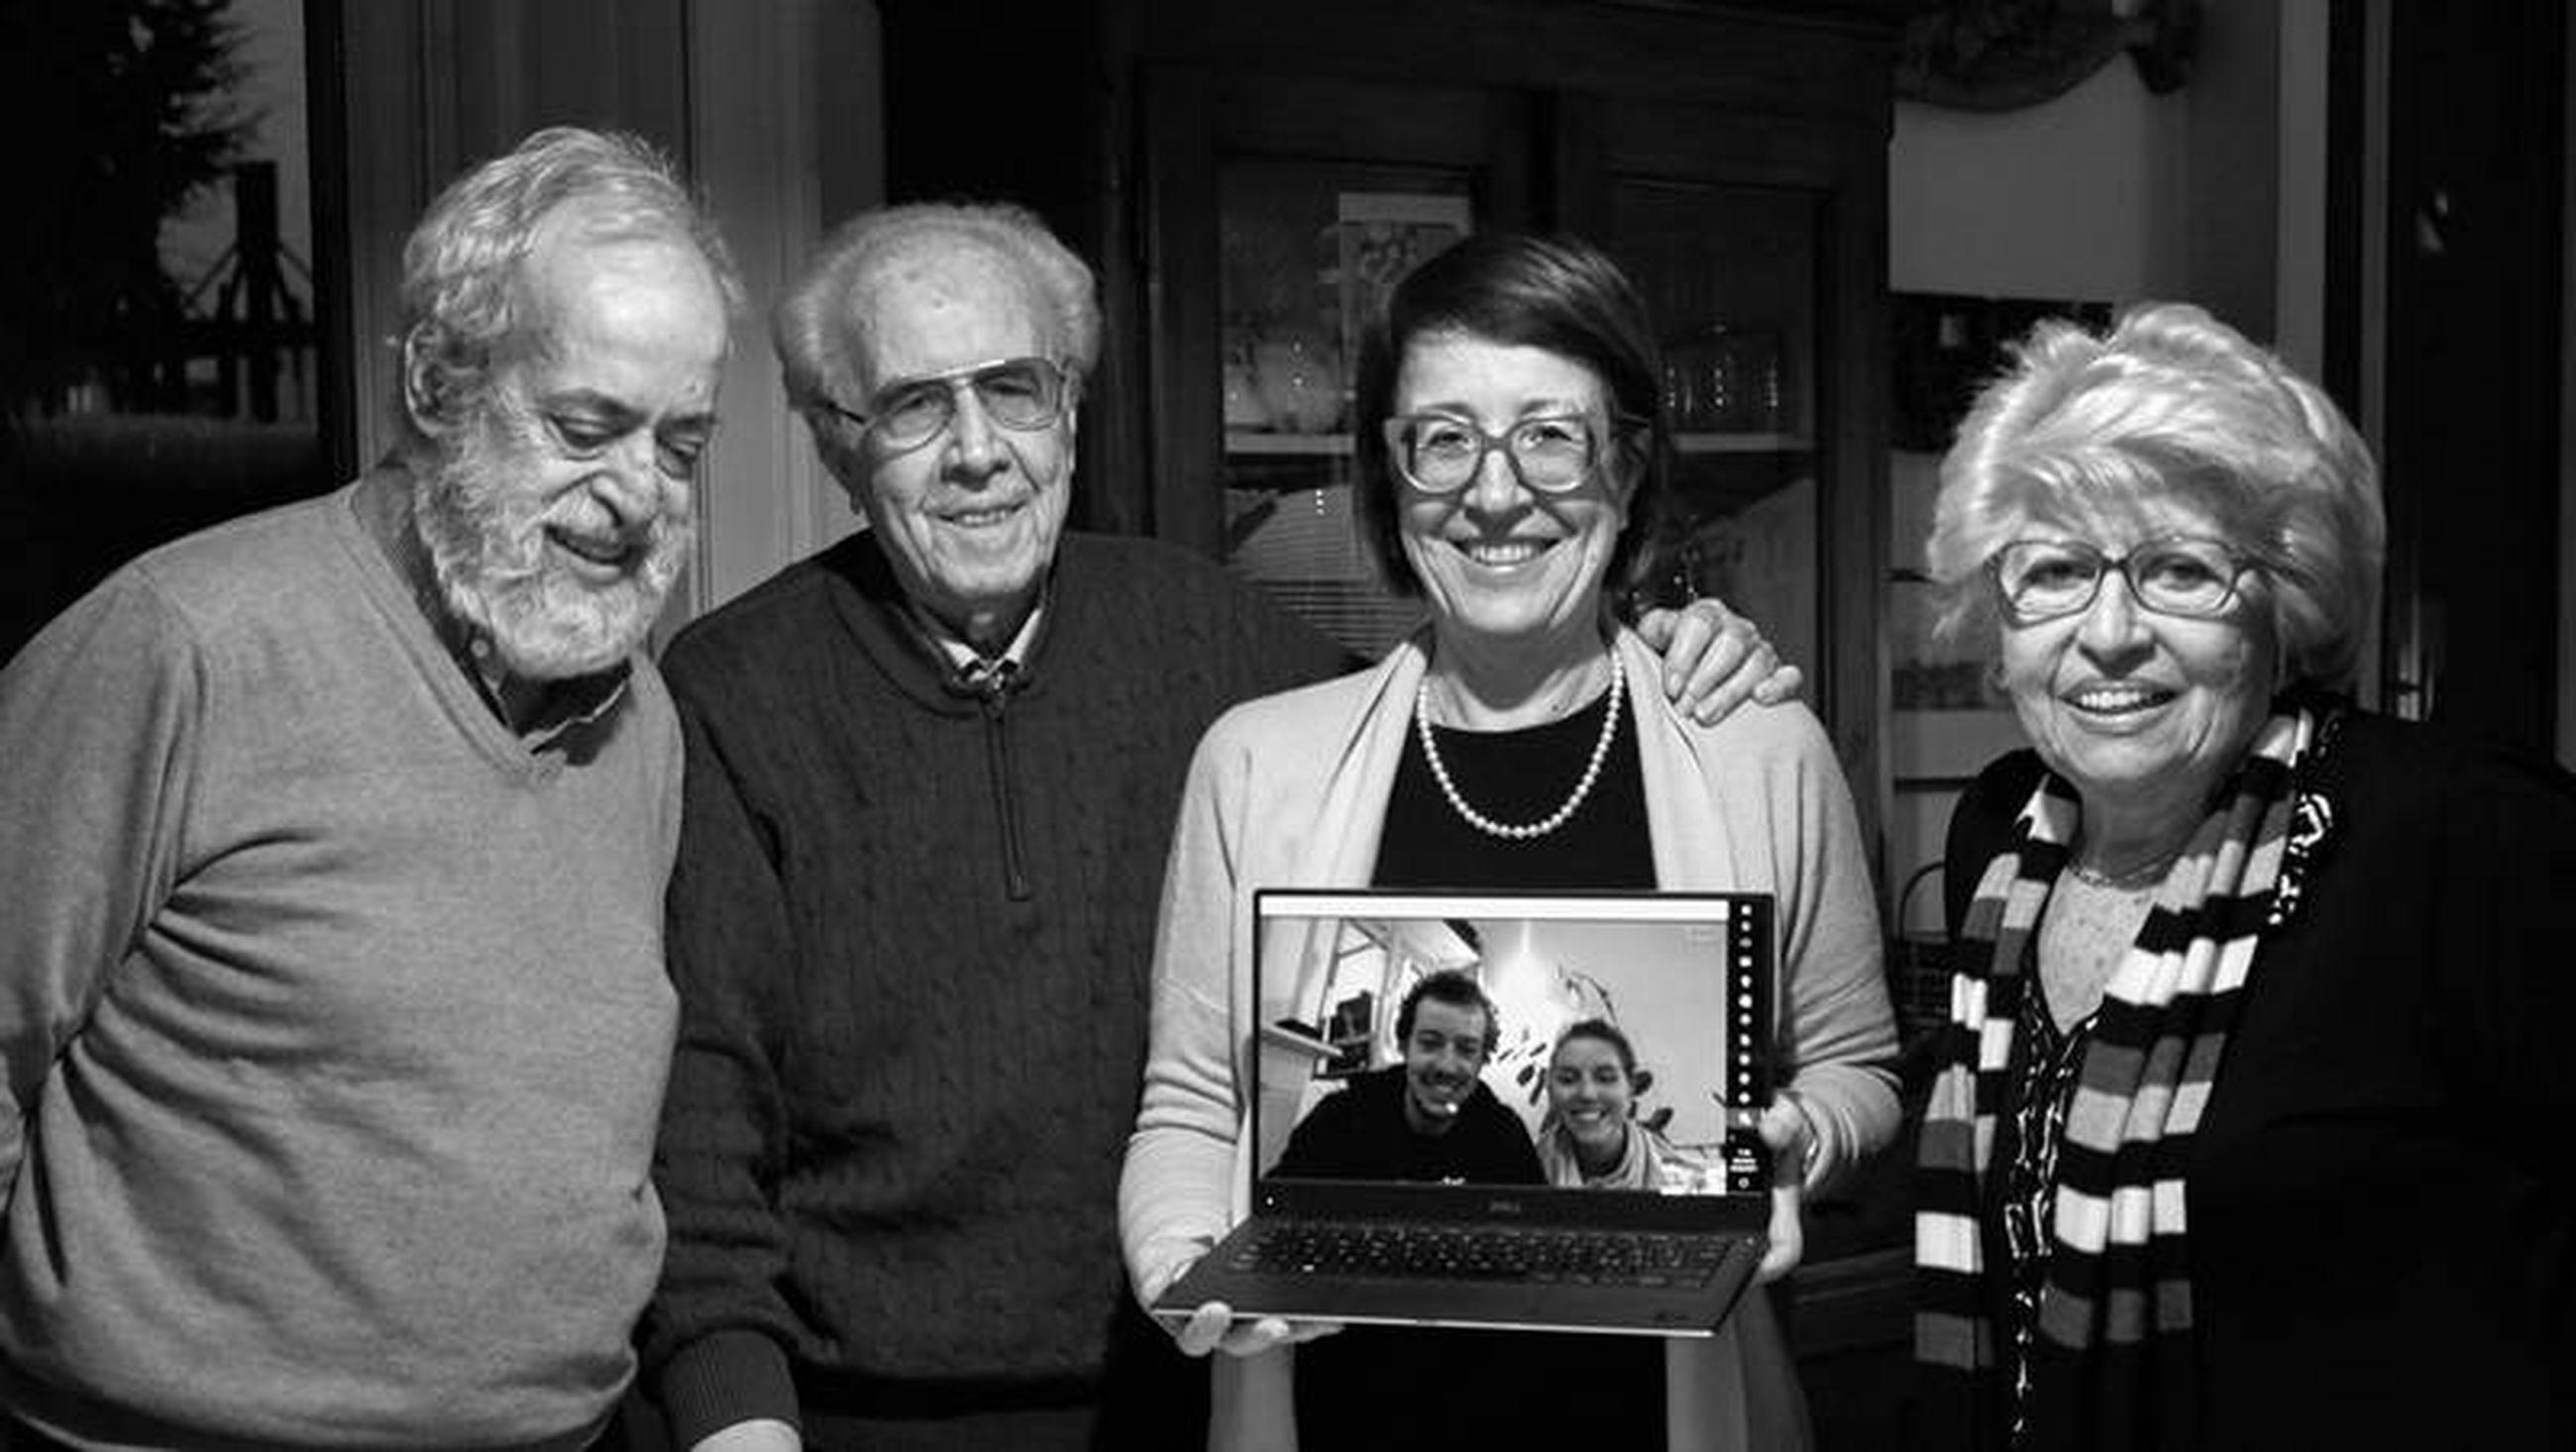 senior adult, eyeglasses, smiling, men, senior men, adult, people, indoors, human body part, adults only